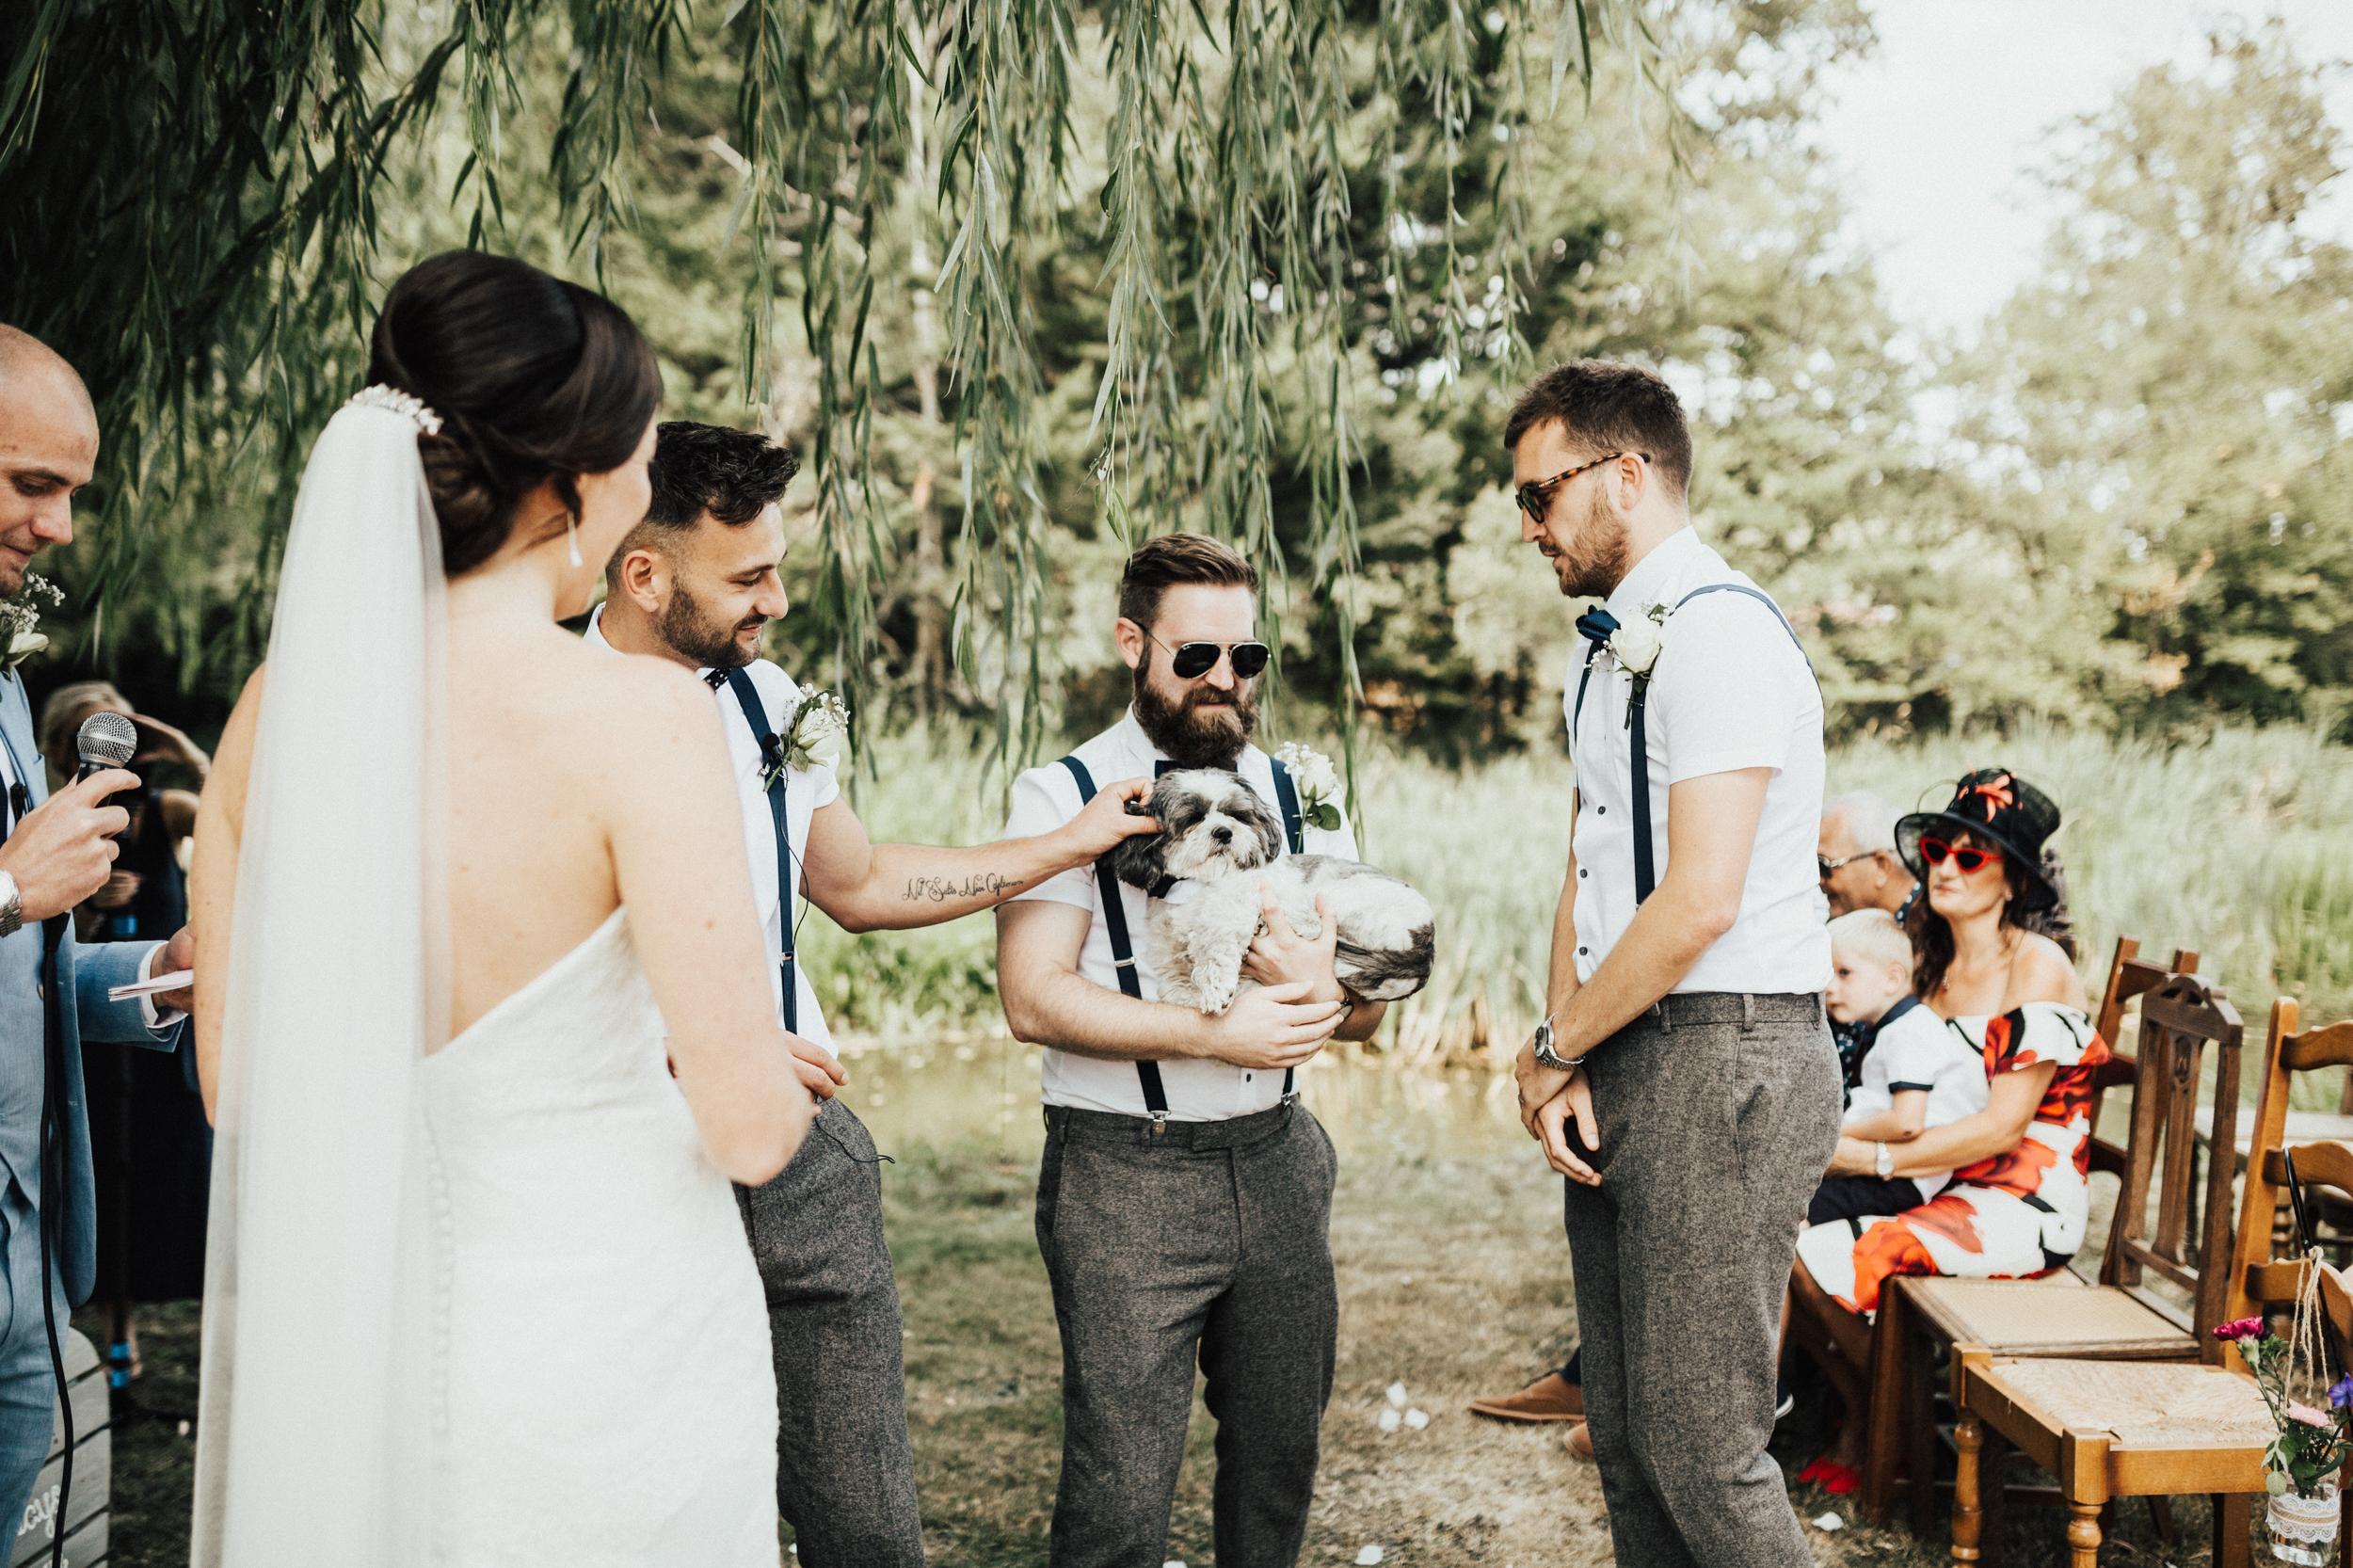 Amy-Zac-Destination-Wedding-France-Manoir-Foulquetiere-Darina-Stoda-Photography-48.jpg